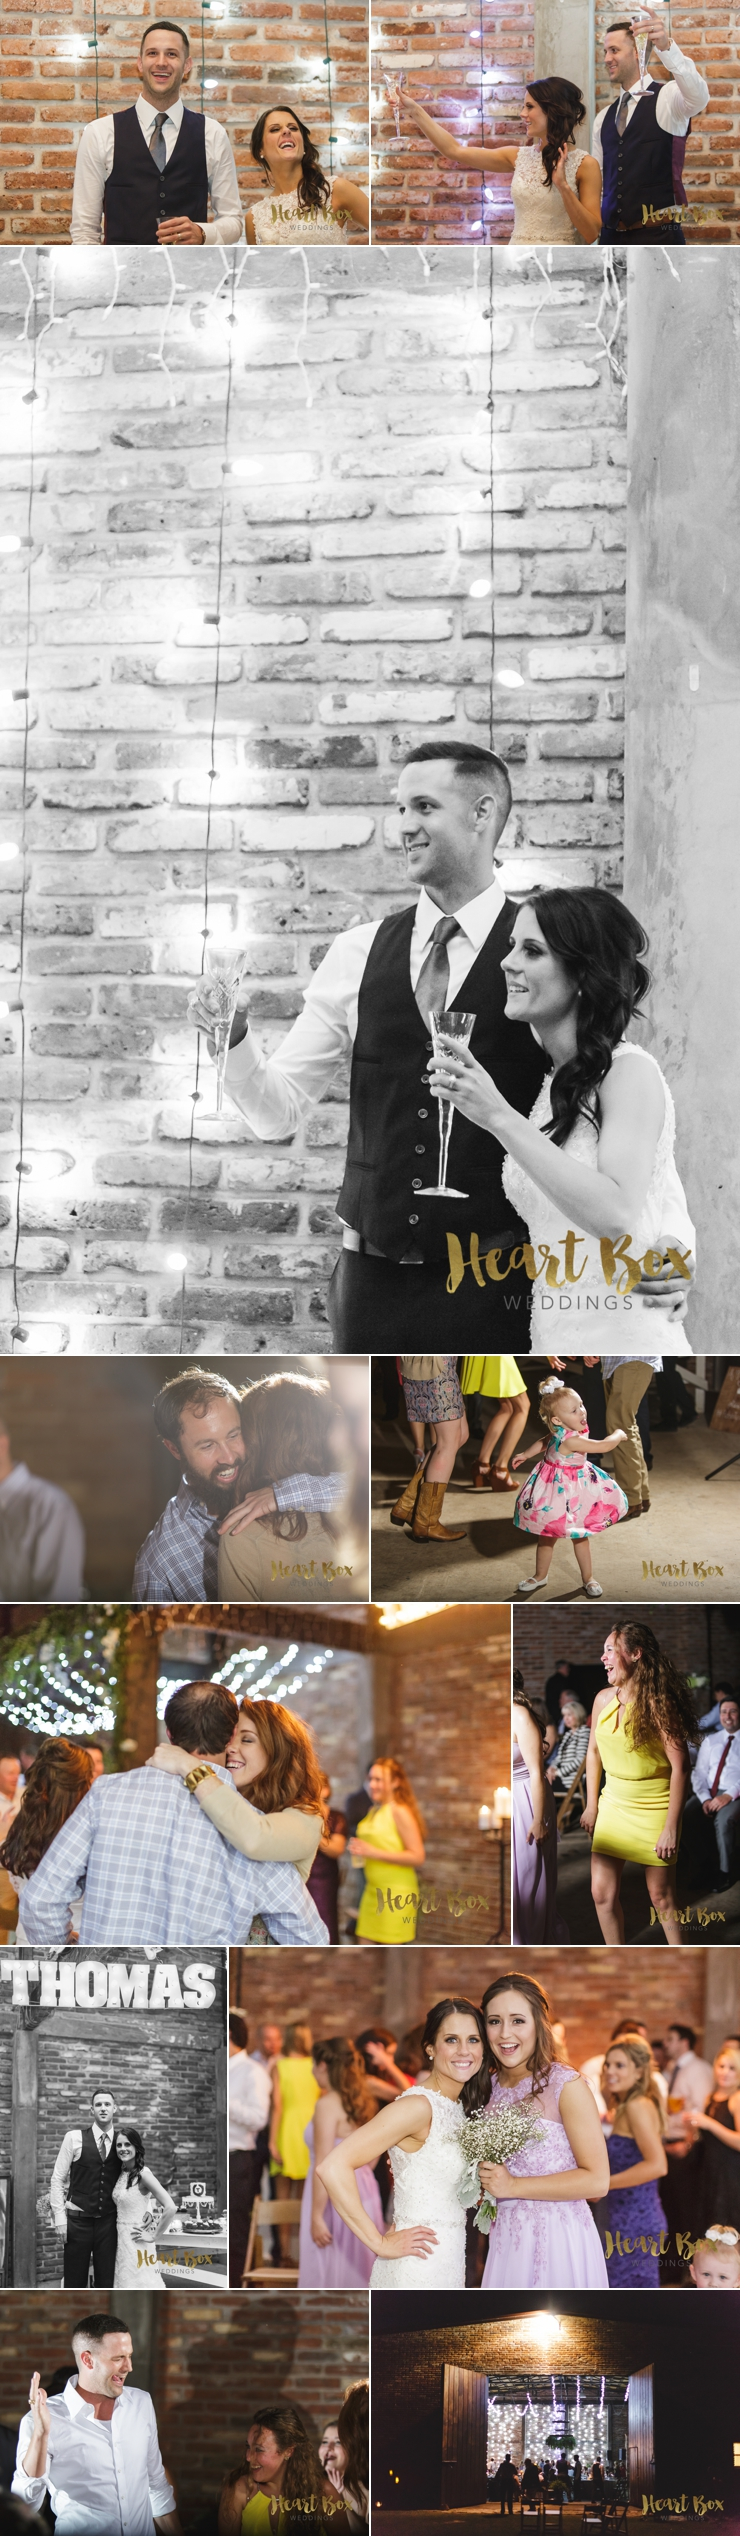 Thomas Wedding Blog Collages 9.jpg